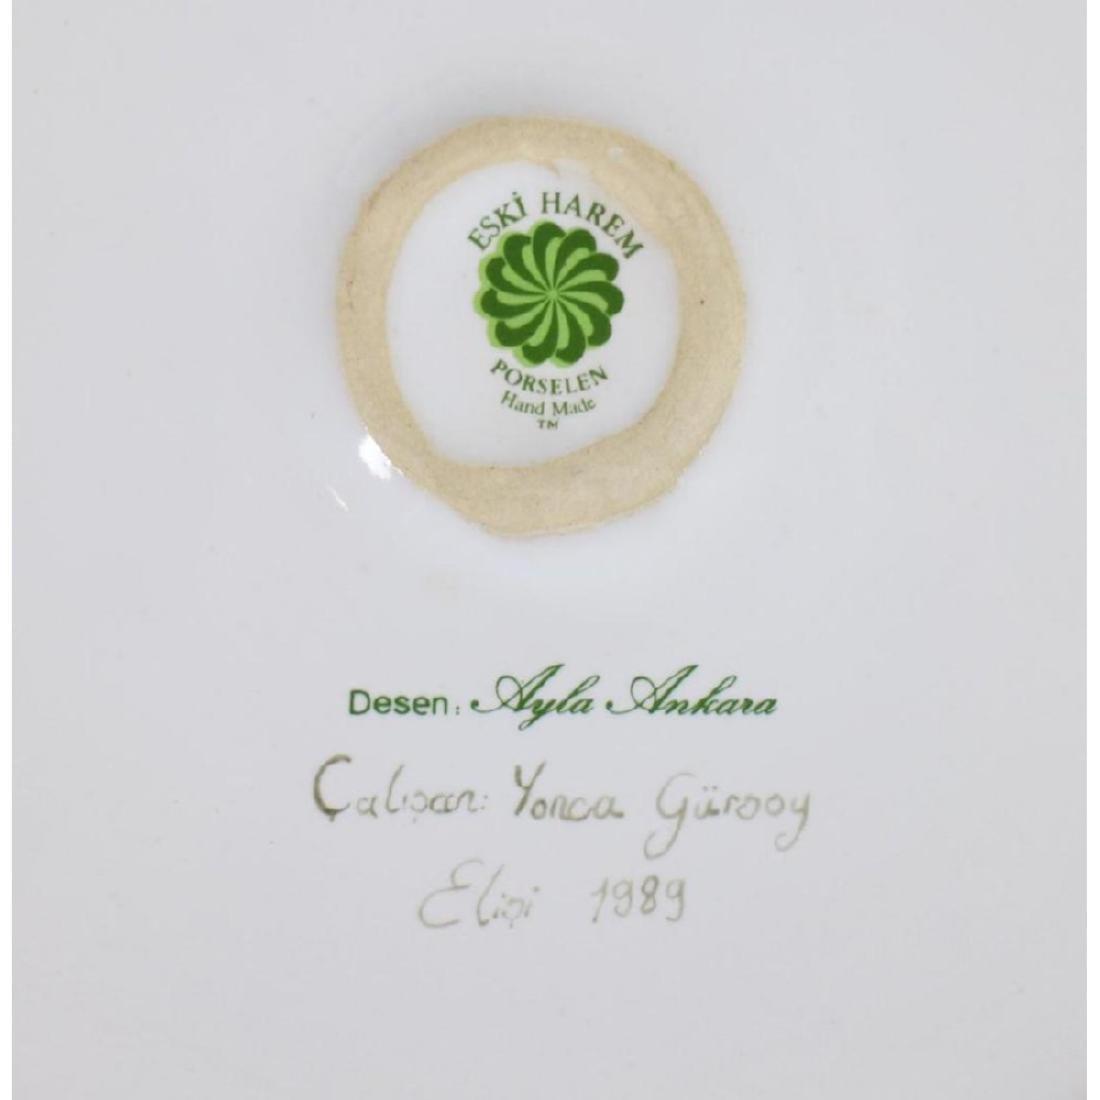 Eski Harem Yonca Gursoy Painted Porcelain Charger - 2